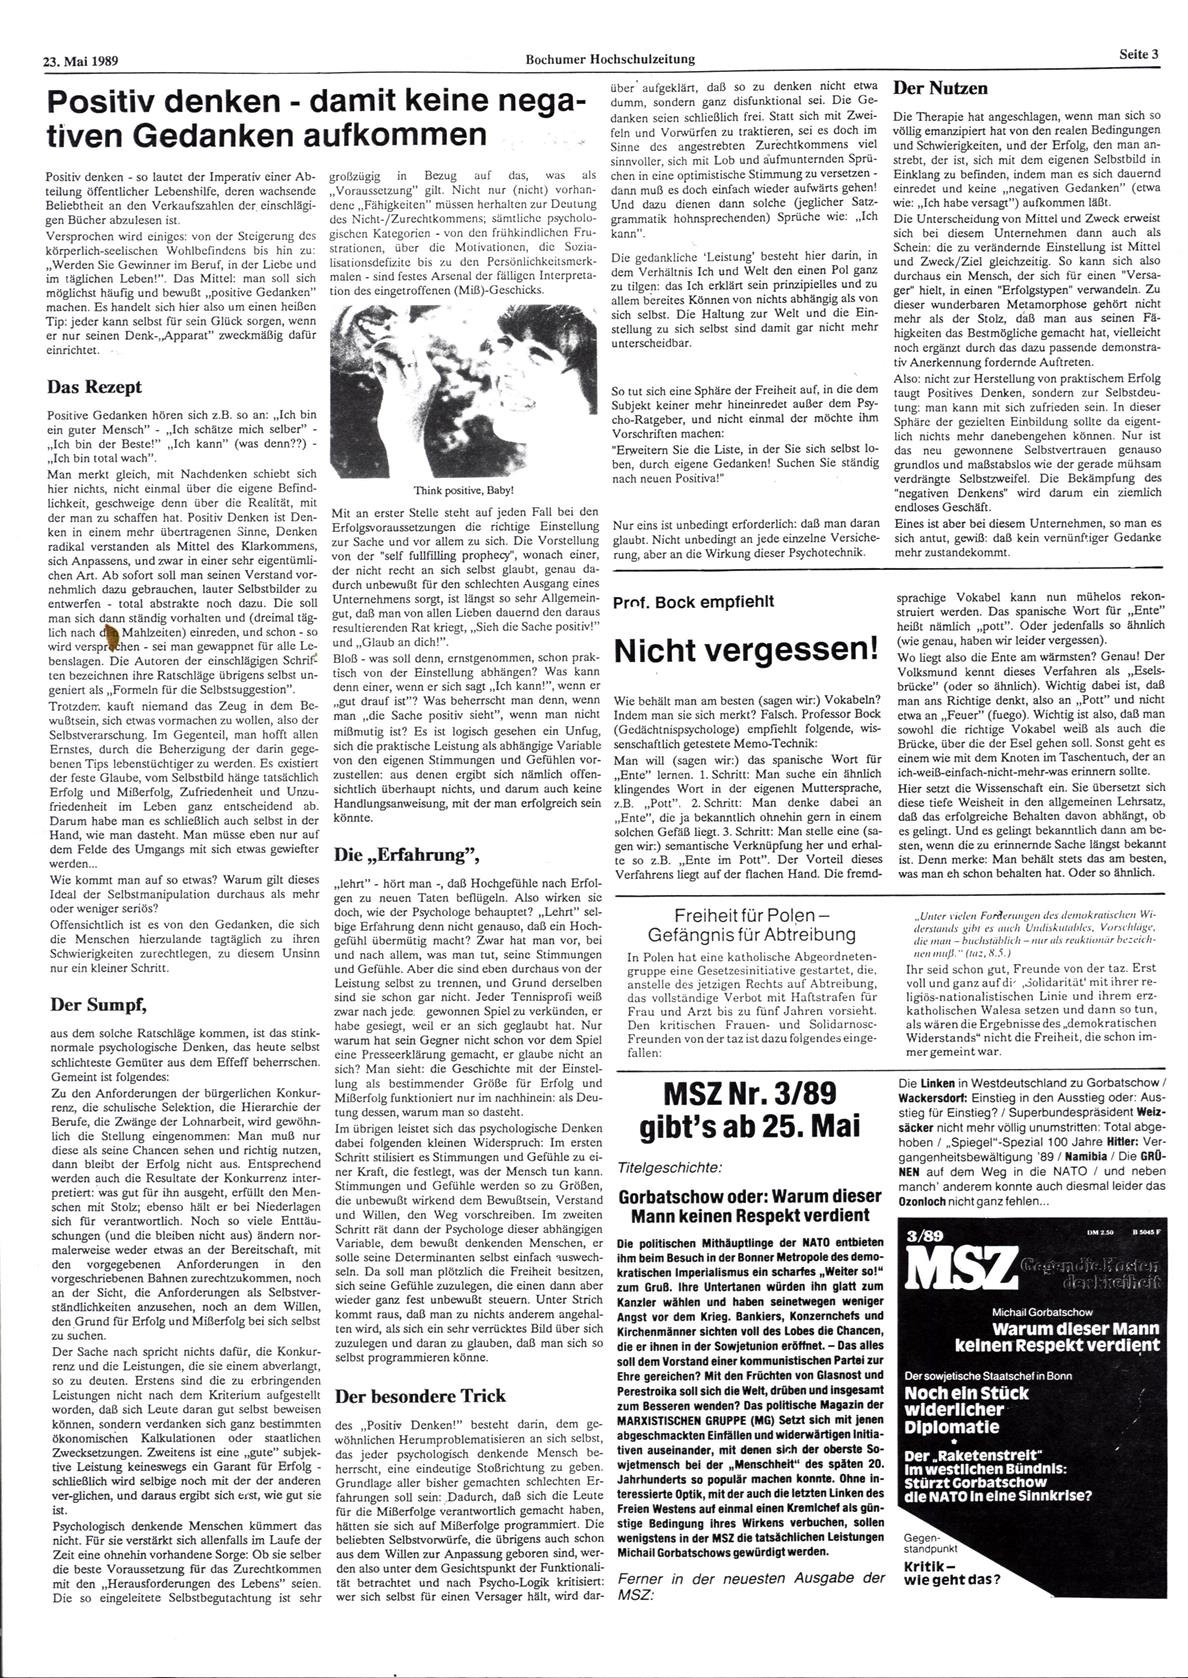 Bochum_BHZ_19890523_189_003